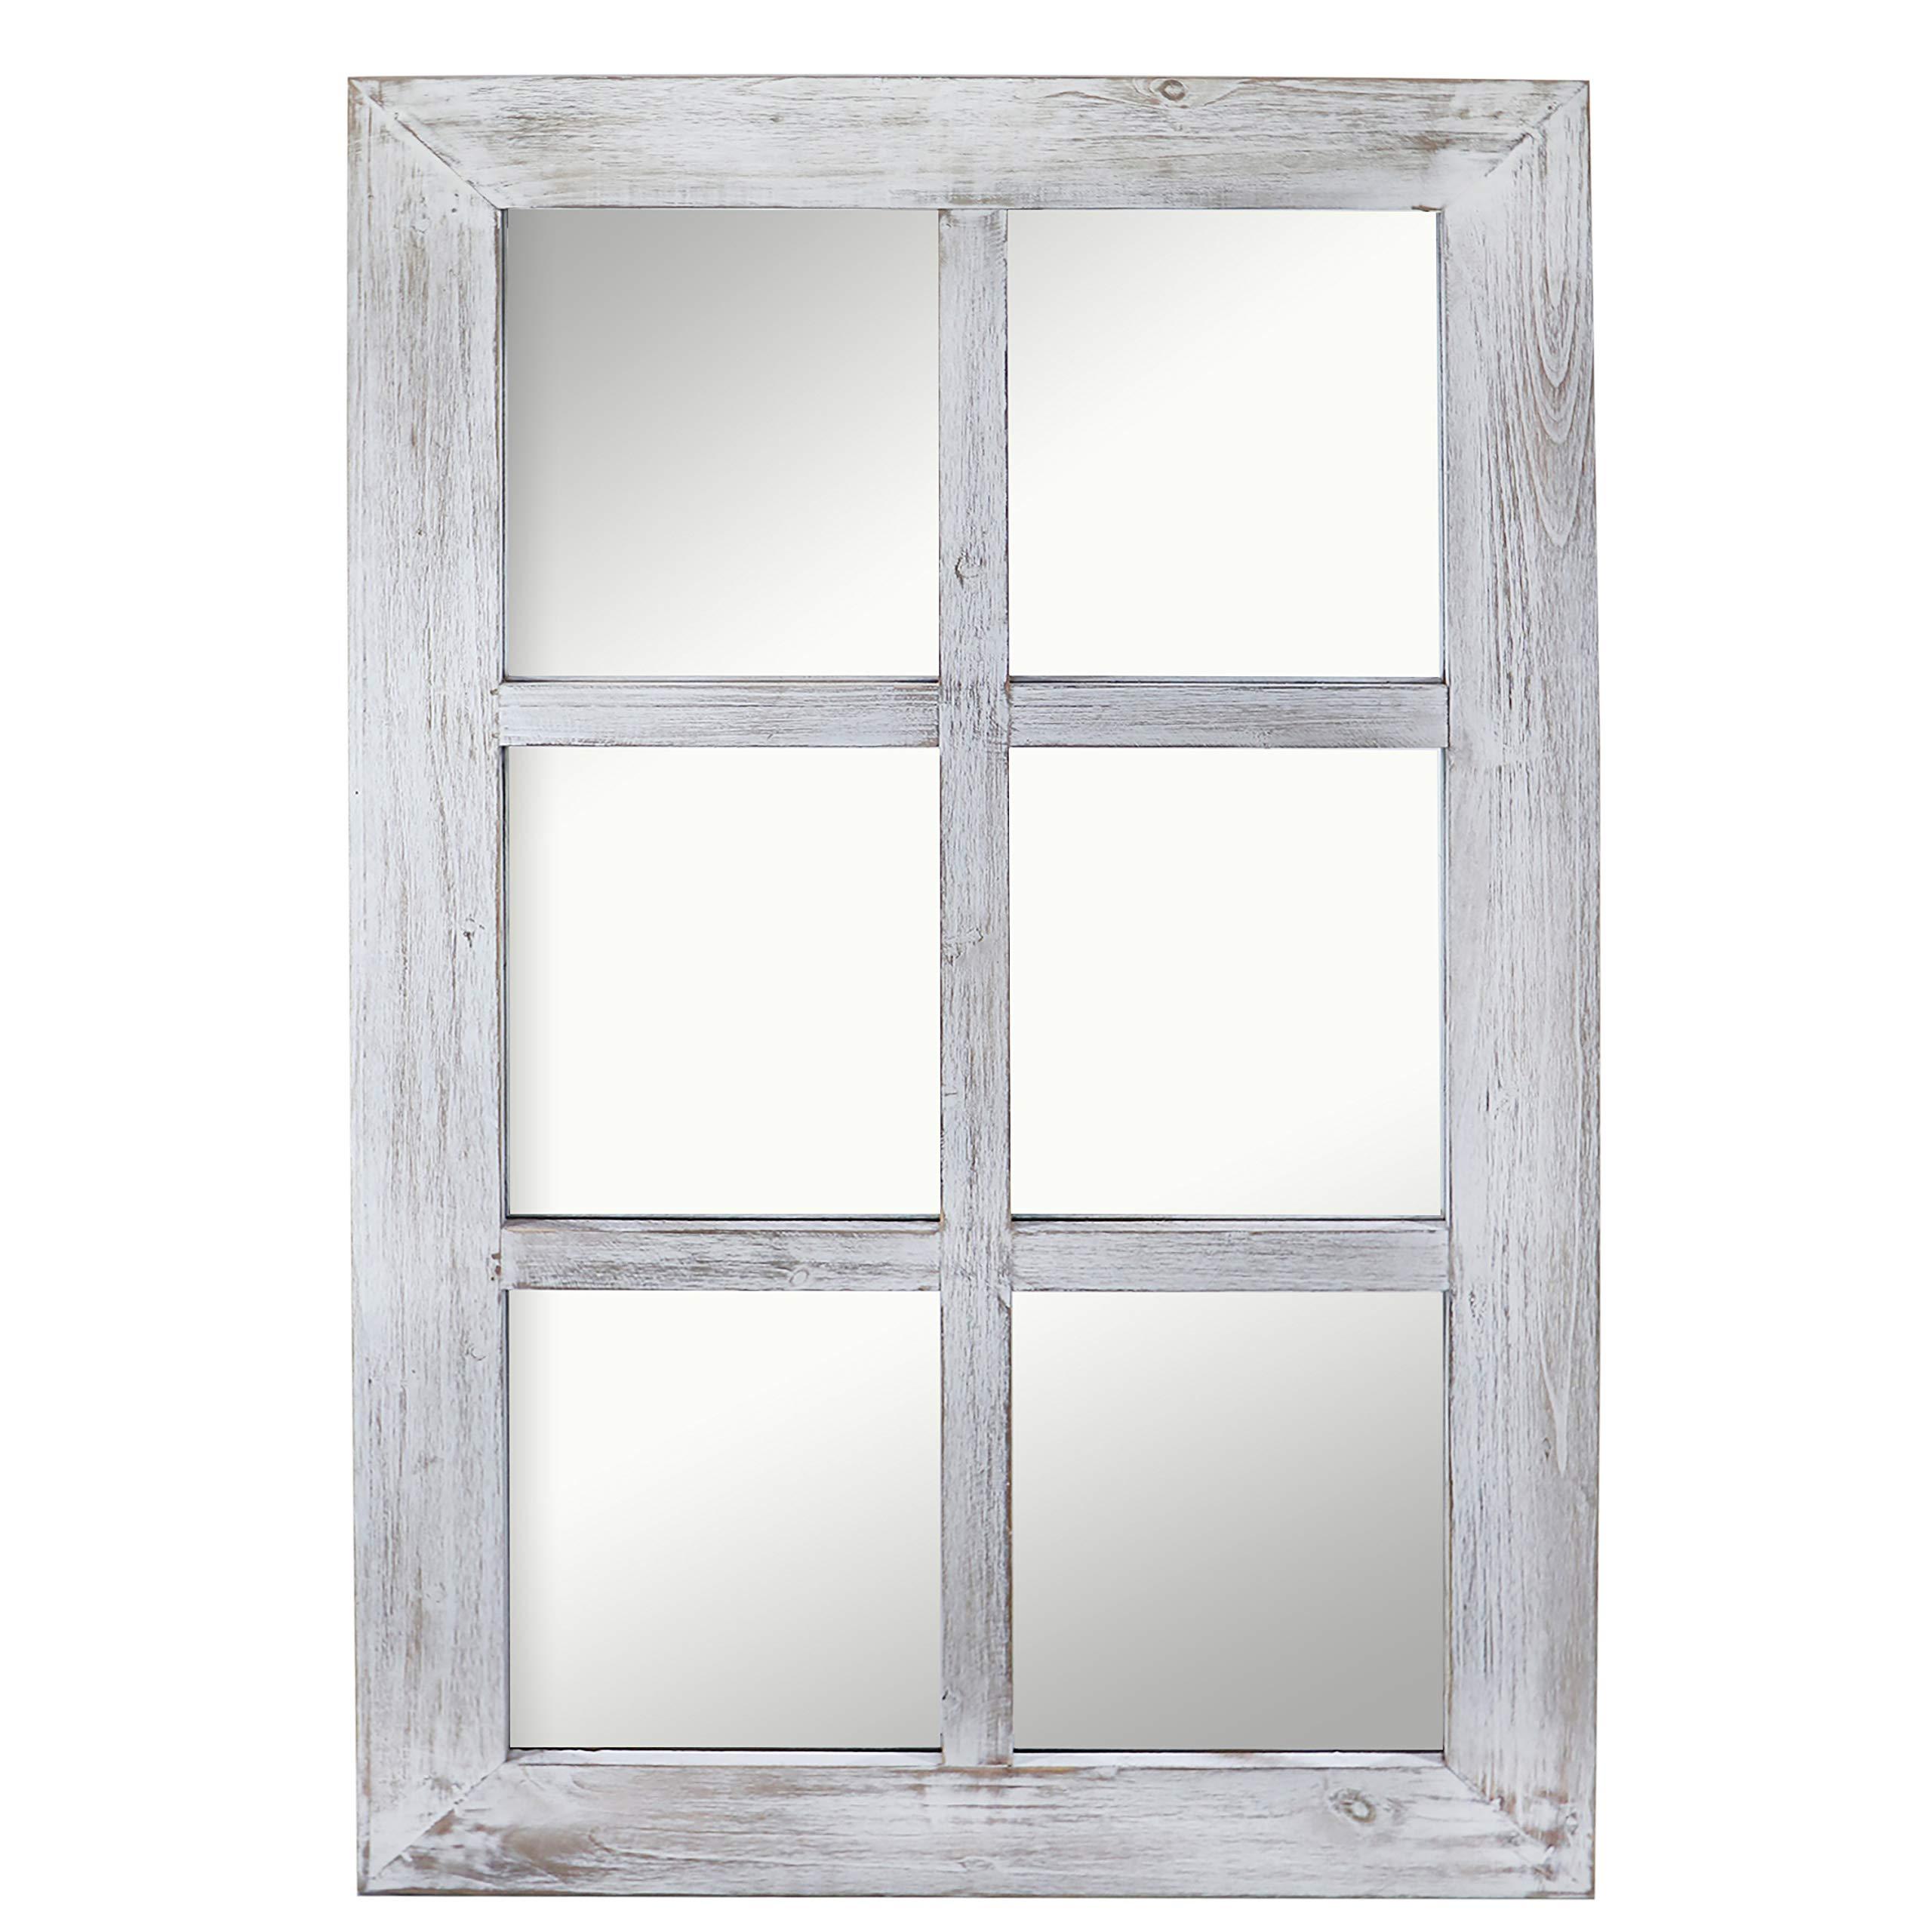 "Barnyard Designs Decorative Windowpane Mirror Rustic Farmhouse Distressed Wood Vertical Hanging Mirror Wall Decor 40'' x 24"""